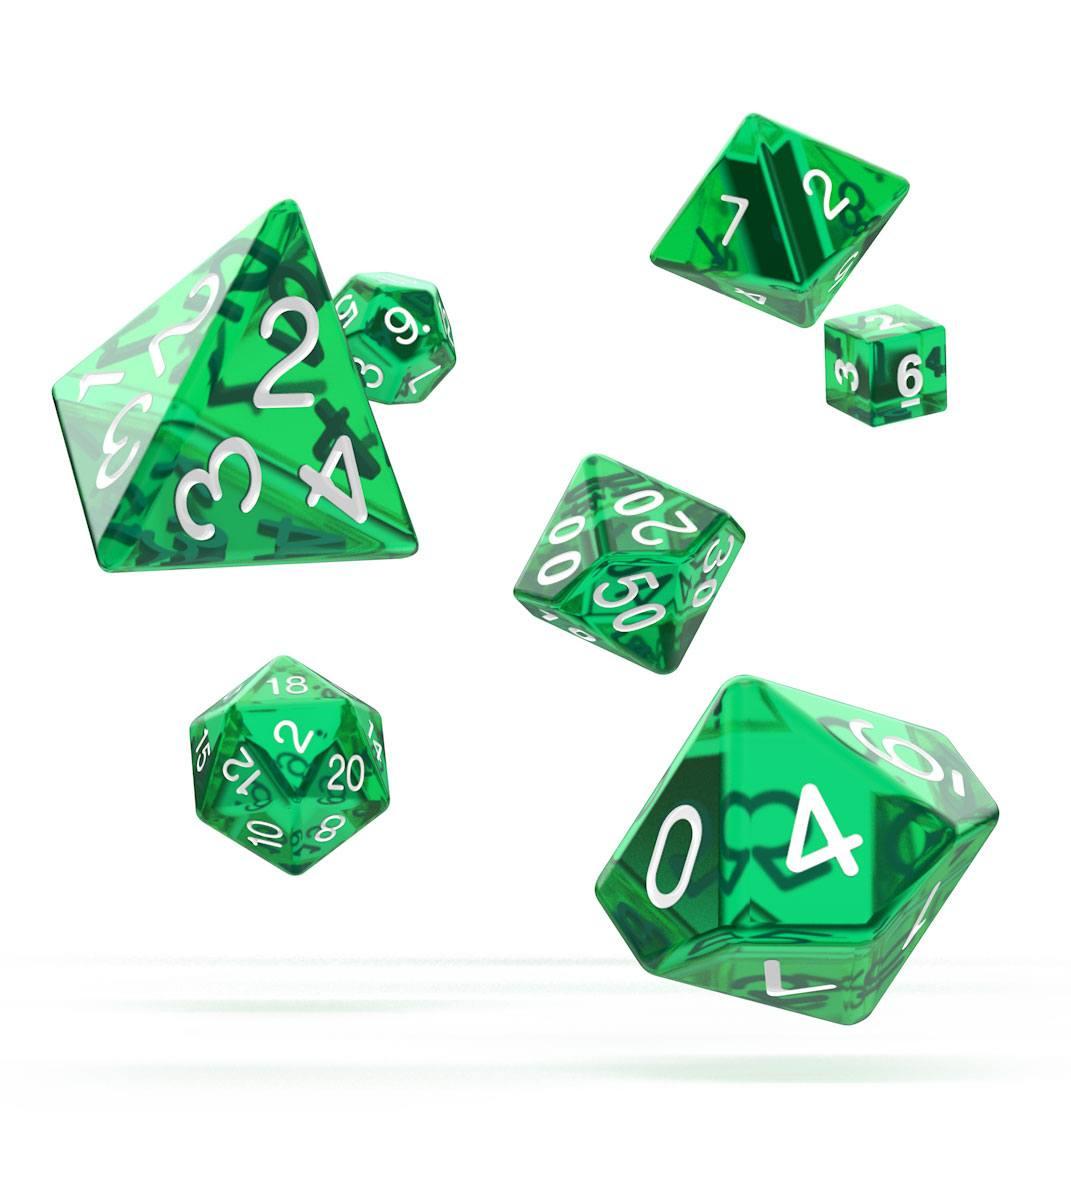 Oakie Doakie Dice RPG Set Translucent - Green (7)